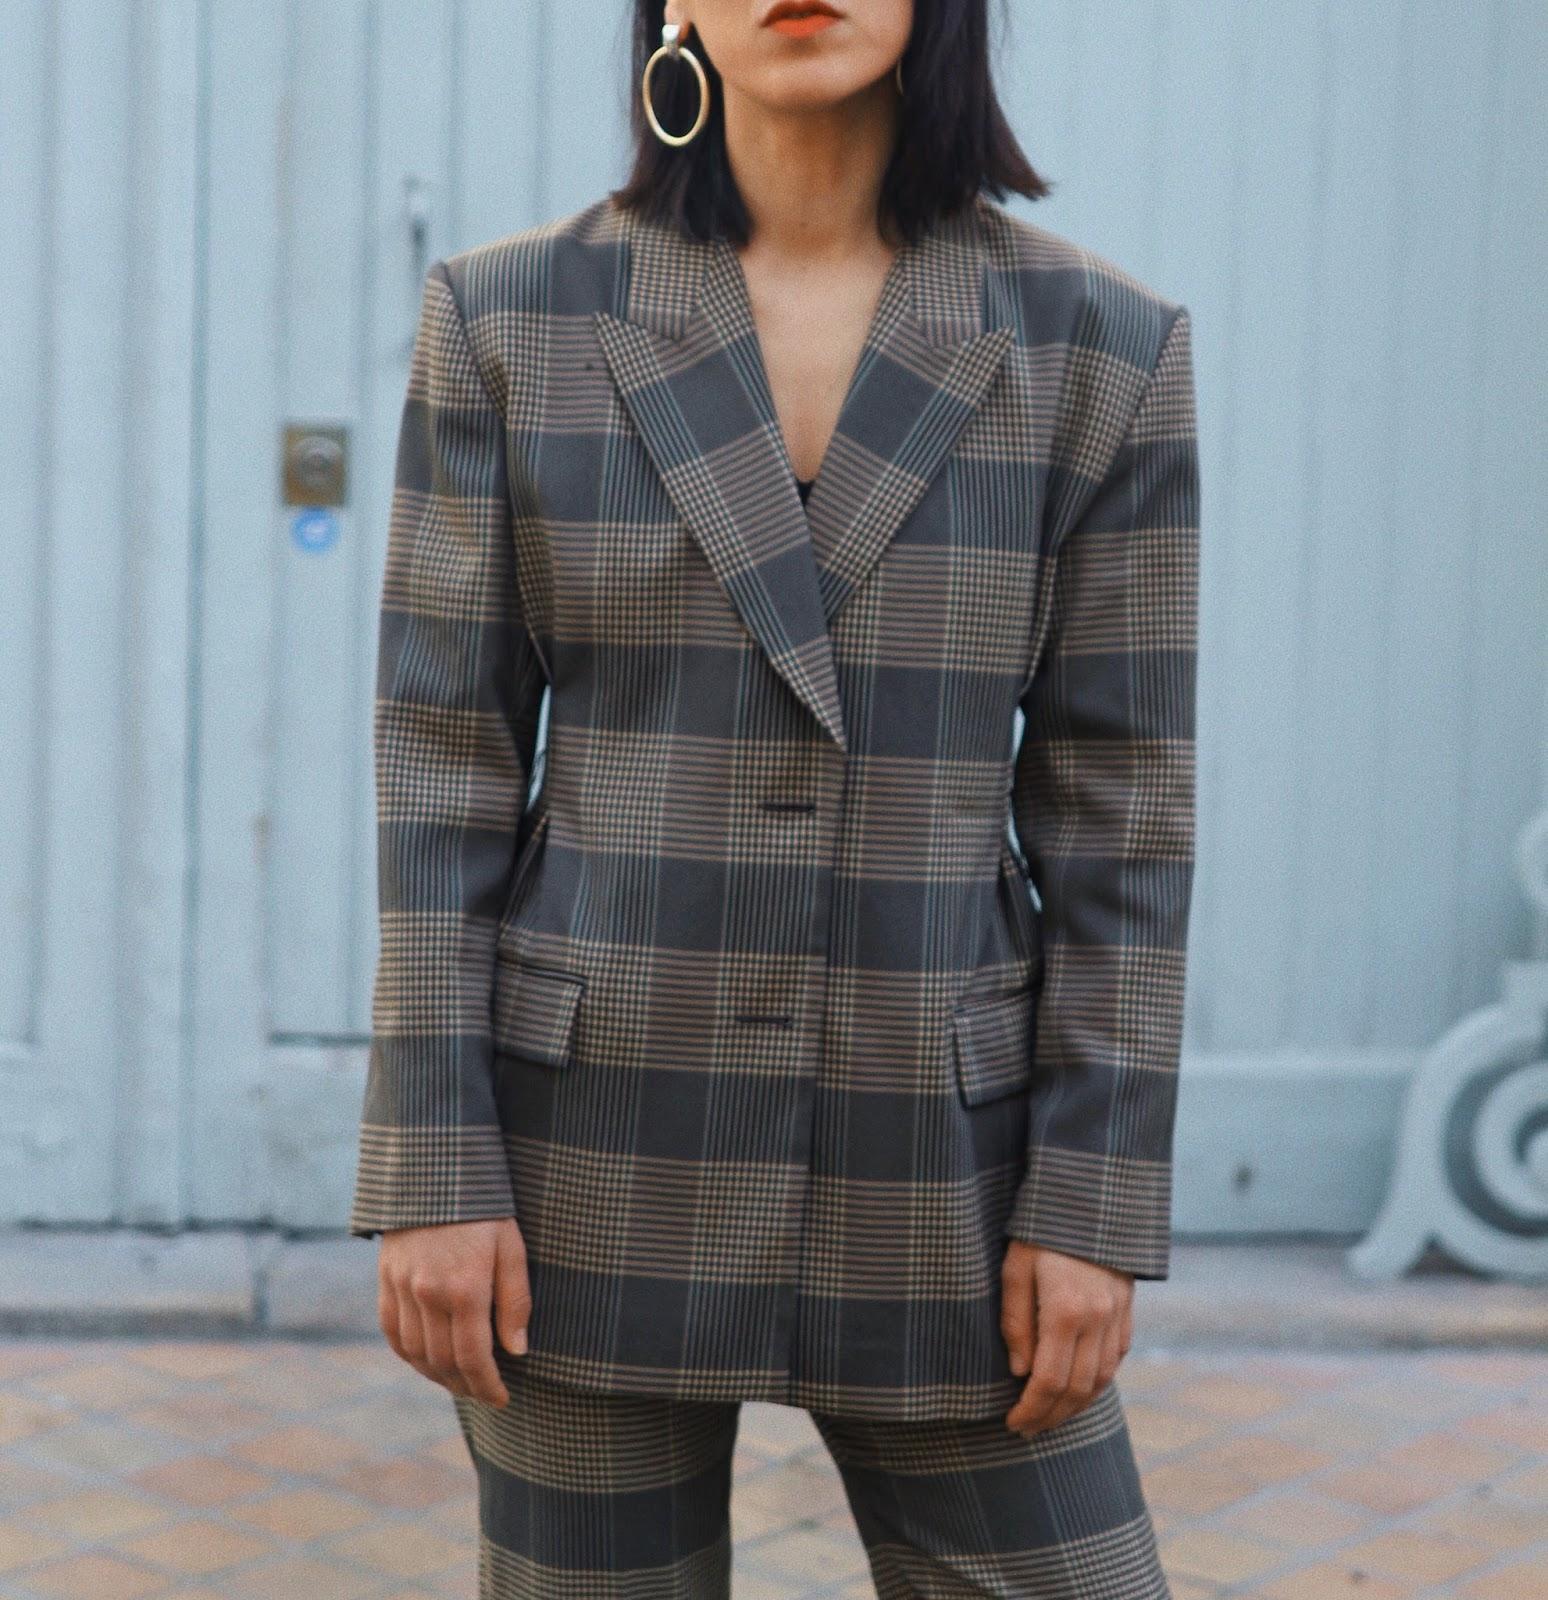 idée de look costume femme printemps 2018